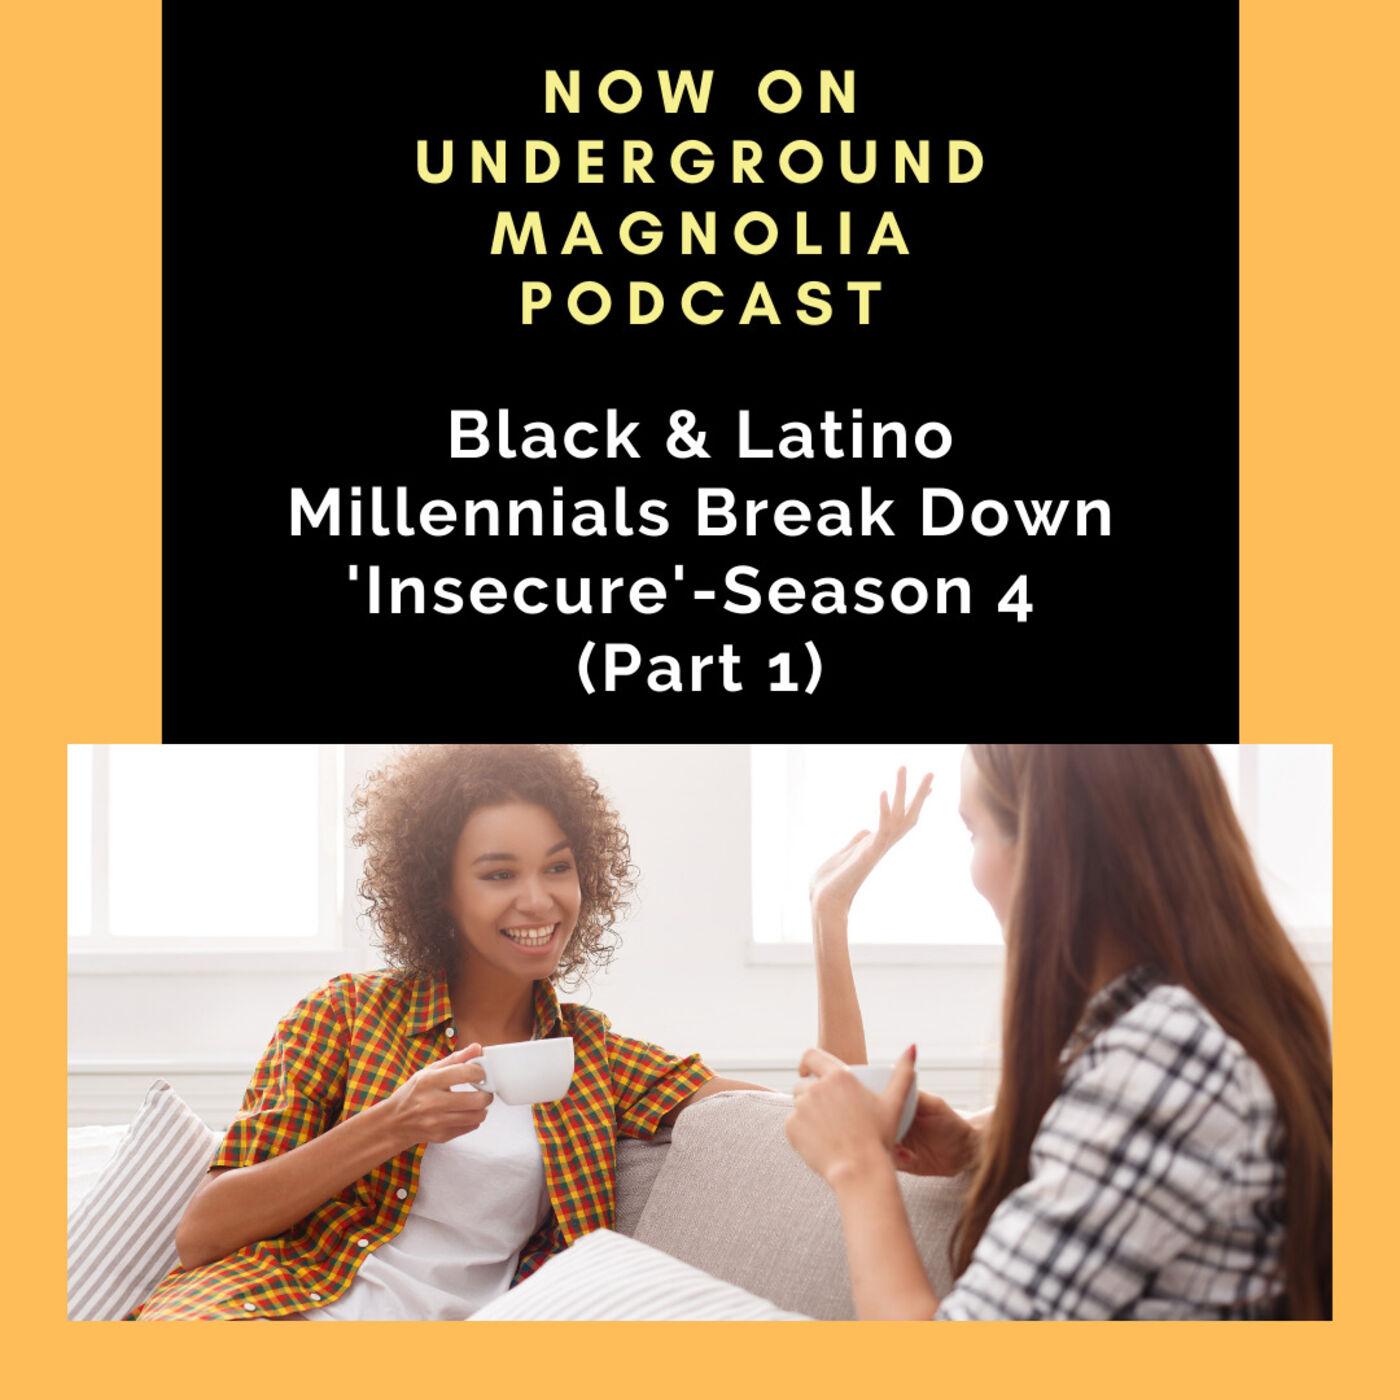 Black & Latino Millennials Break Down 'Insecure'-Season 4 (Part 1)